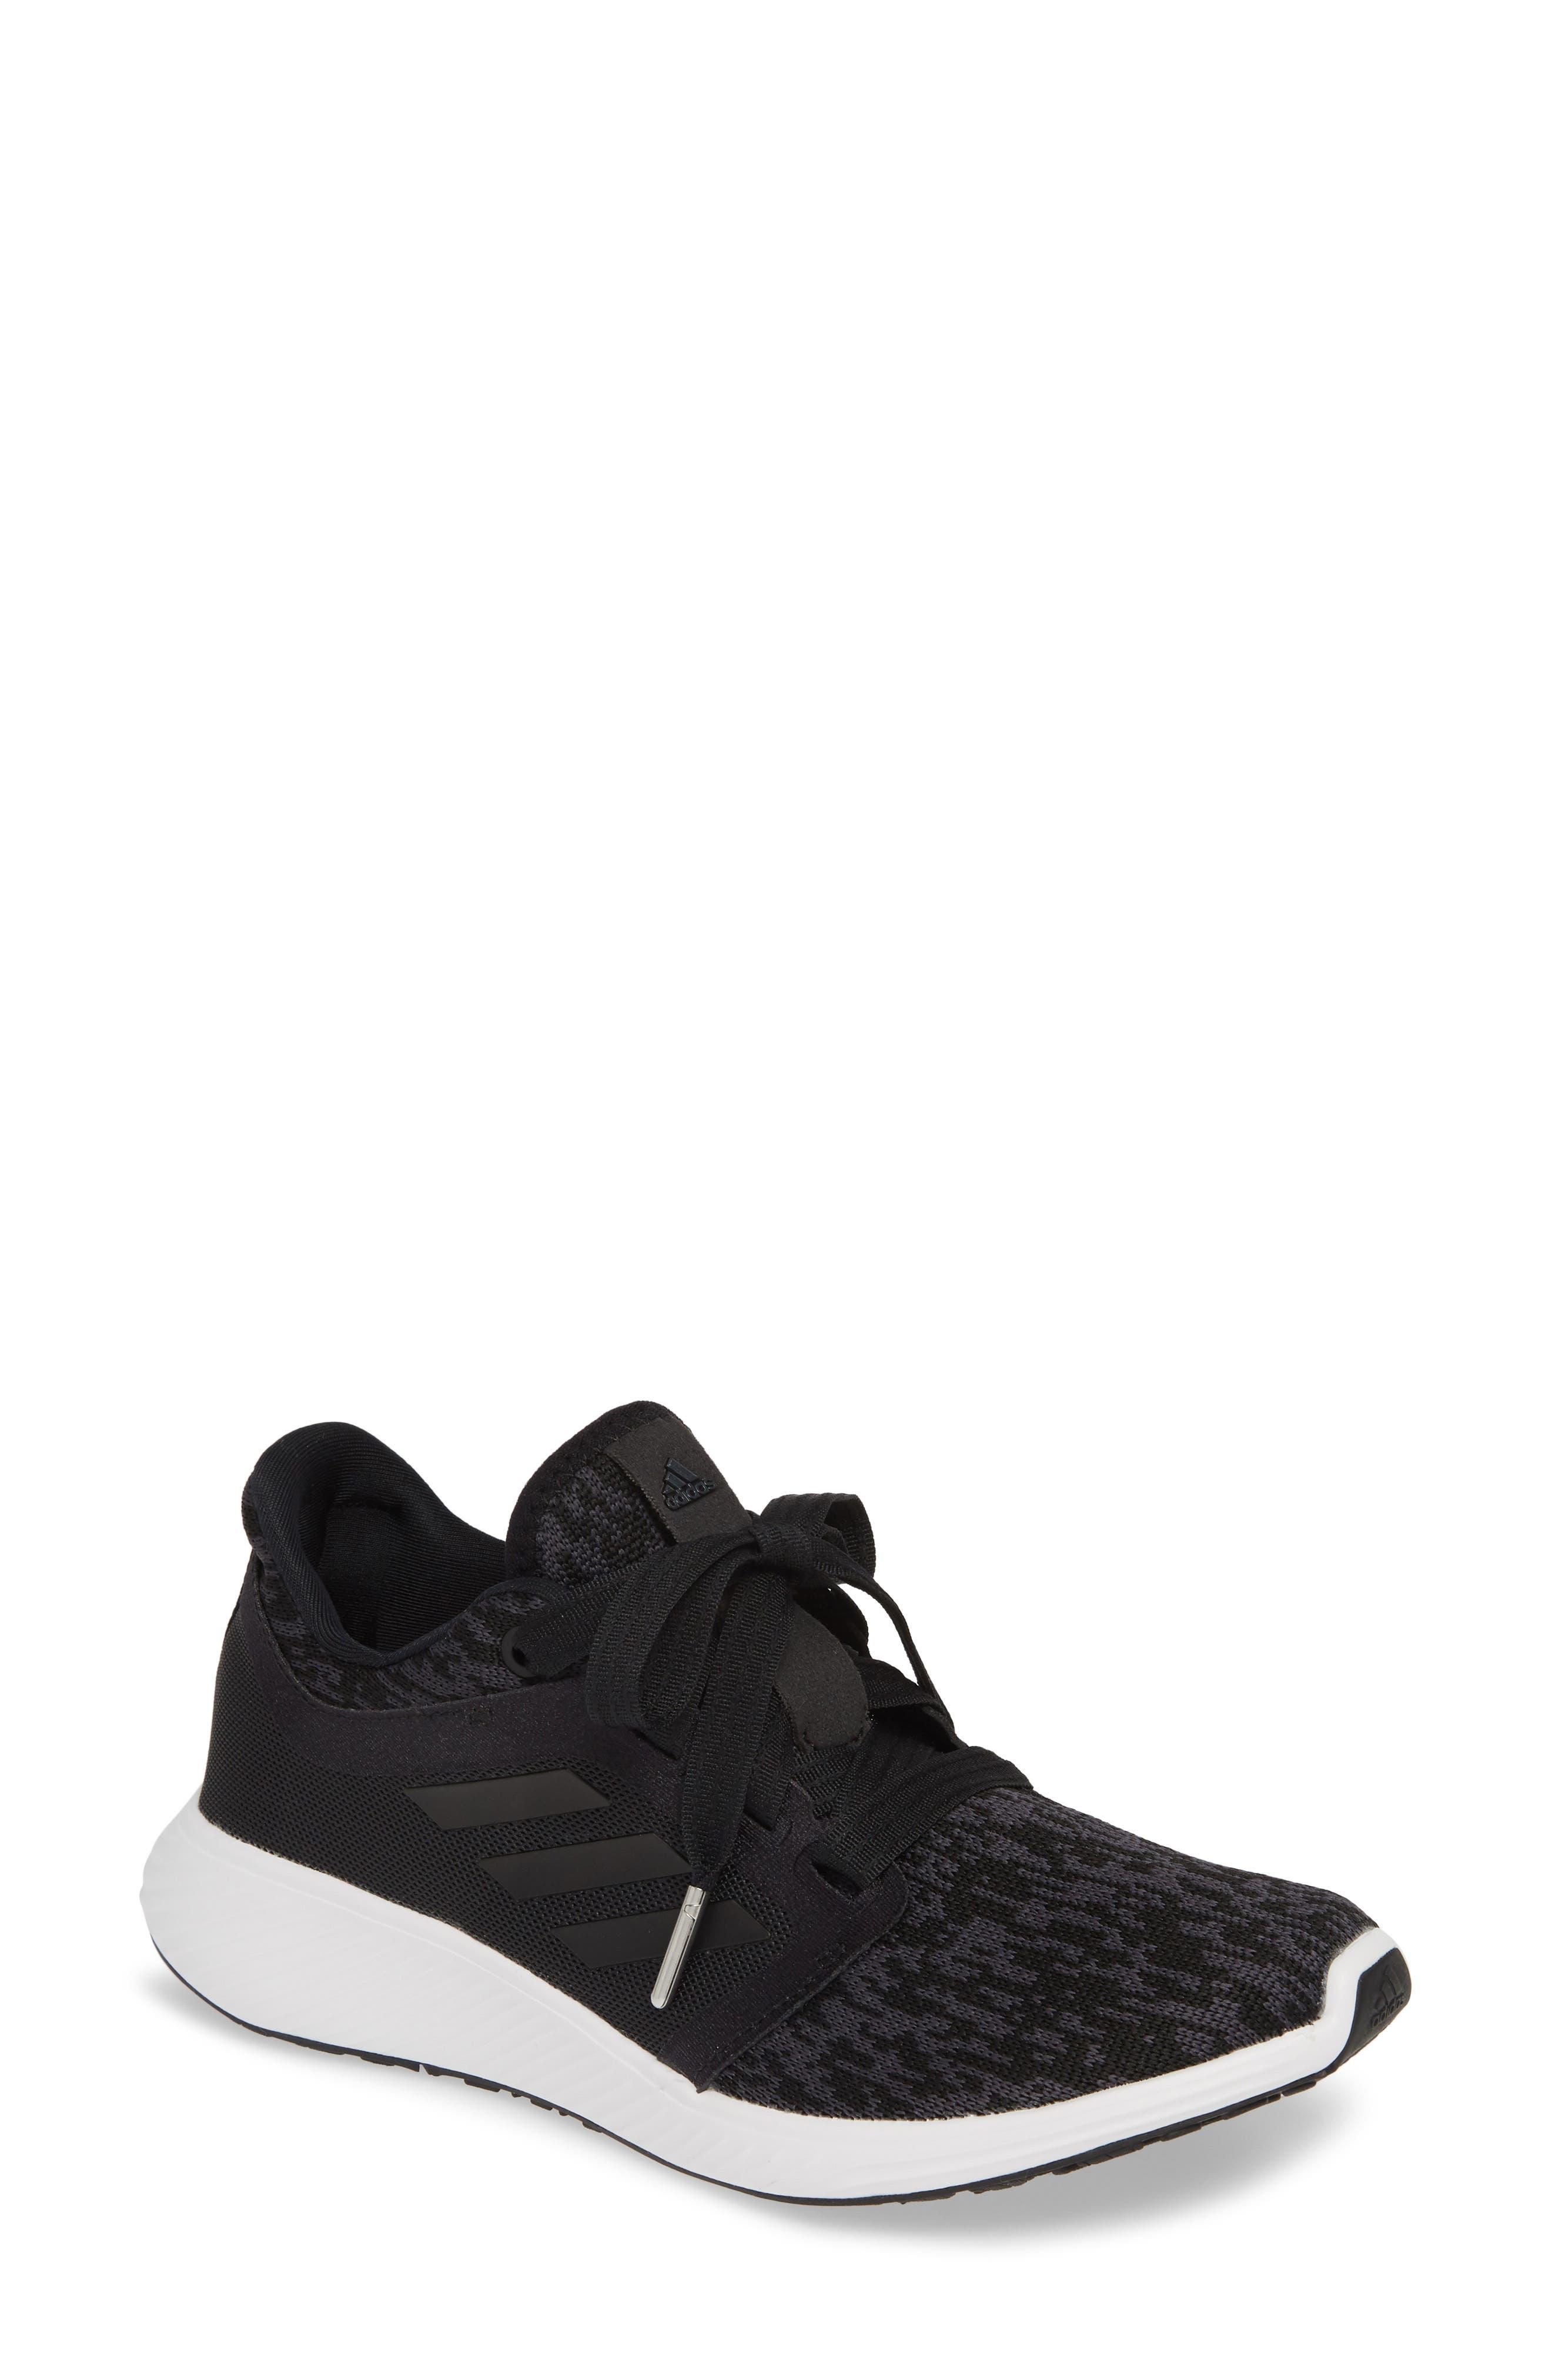 Adidas Edge Lux 3 Running Shoe, / 5 Men